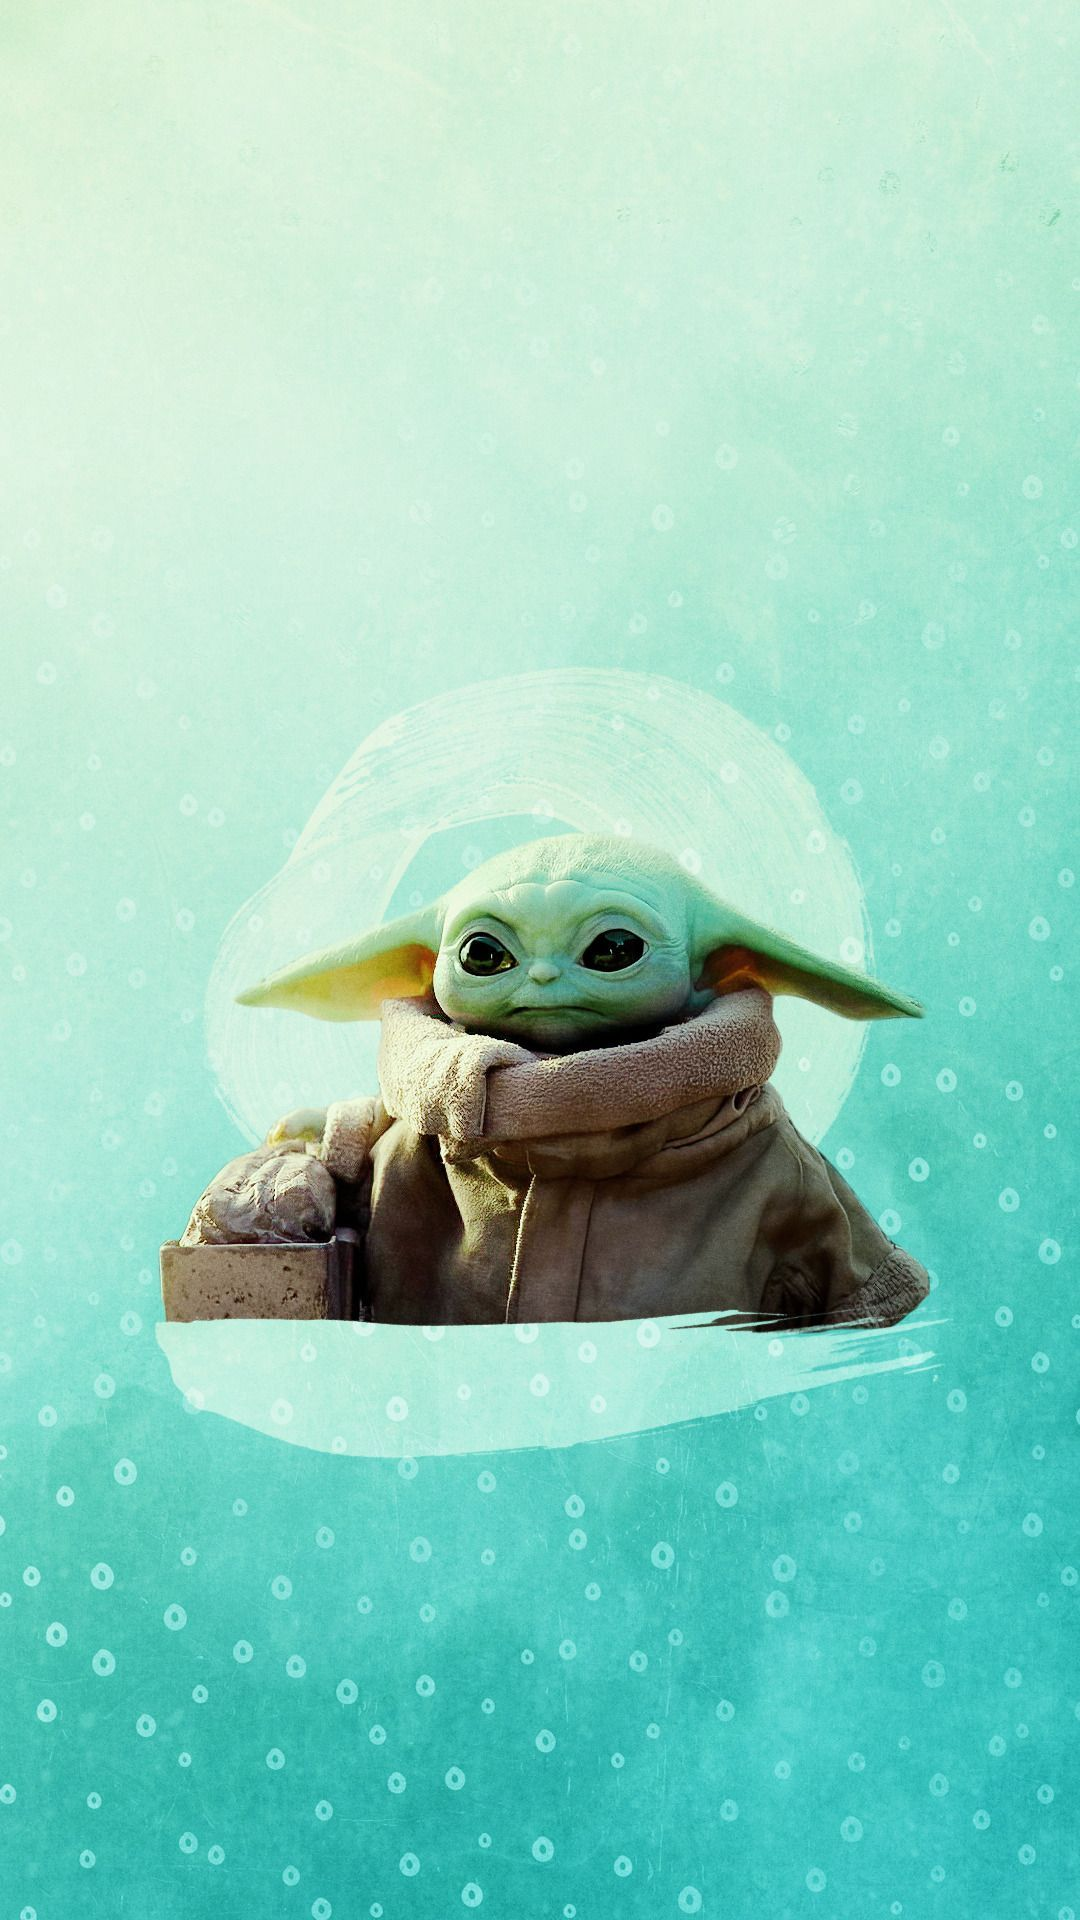 Cute Baby Yoda Wallpaper Ios Babyyodawallpaper 9 Best Cute Baby Yoda Wallpaper Ios Cute Baby Yoda Wallpaper Yoda Wallpaper Star Wars Fan Art Wallpaper